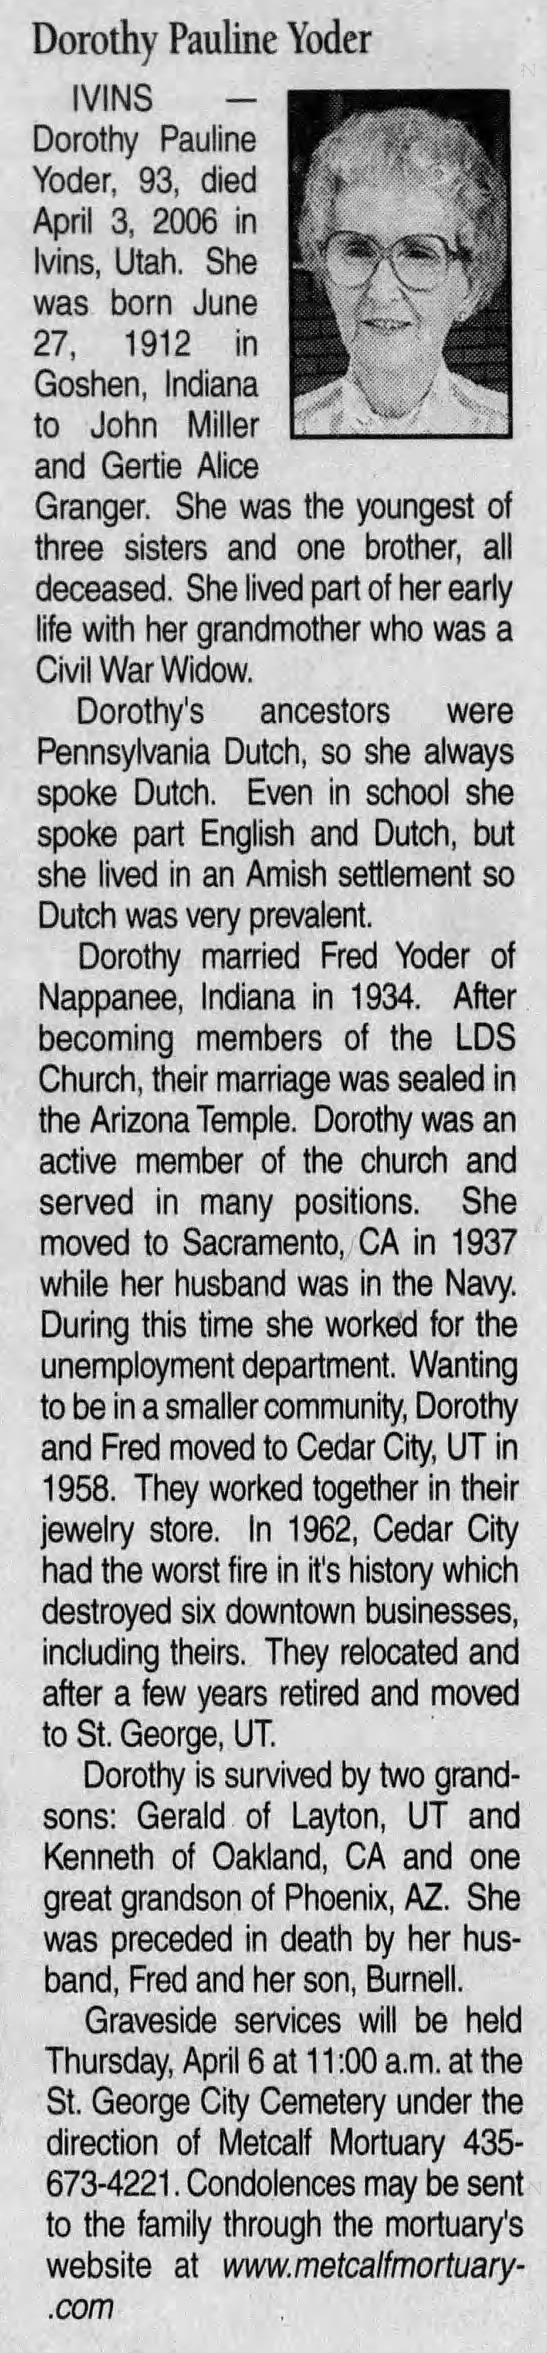 The Daily Spectrum (Saint George, Utah) 06 Apr 2006, Thursday, Page 5 - Dorothy Pauline Yoder IVINS -Dorothy -Dorothy...